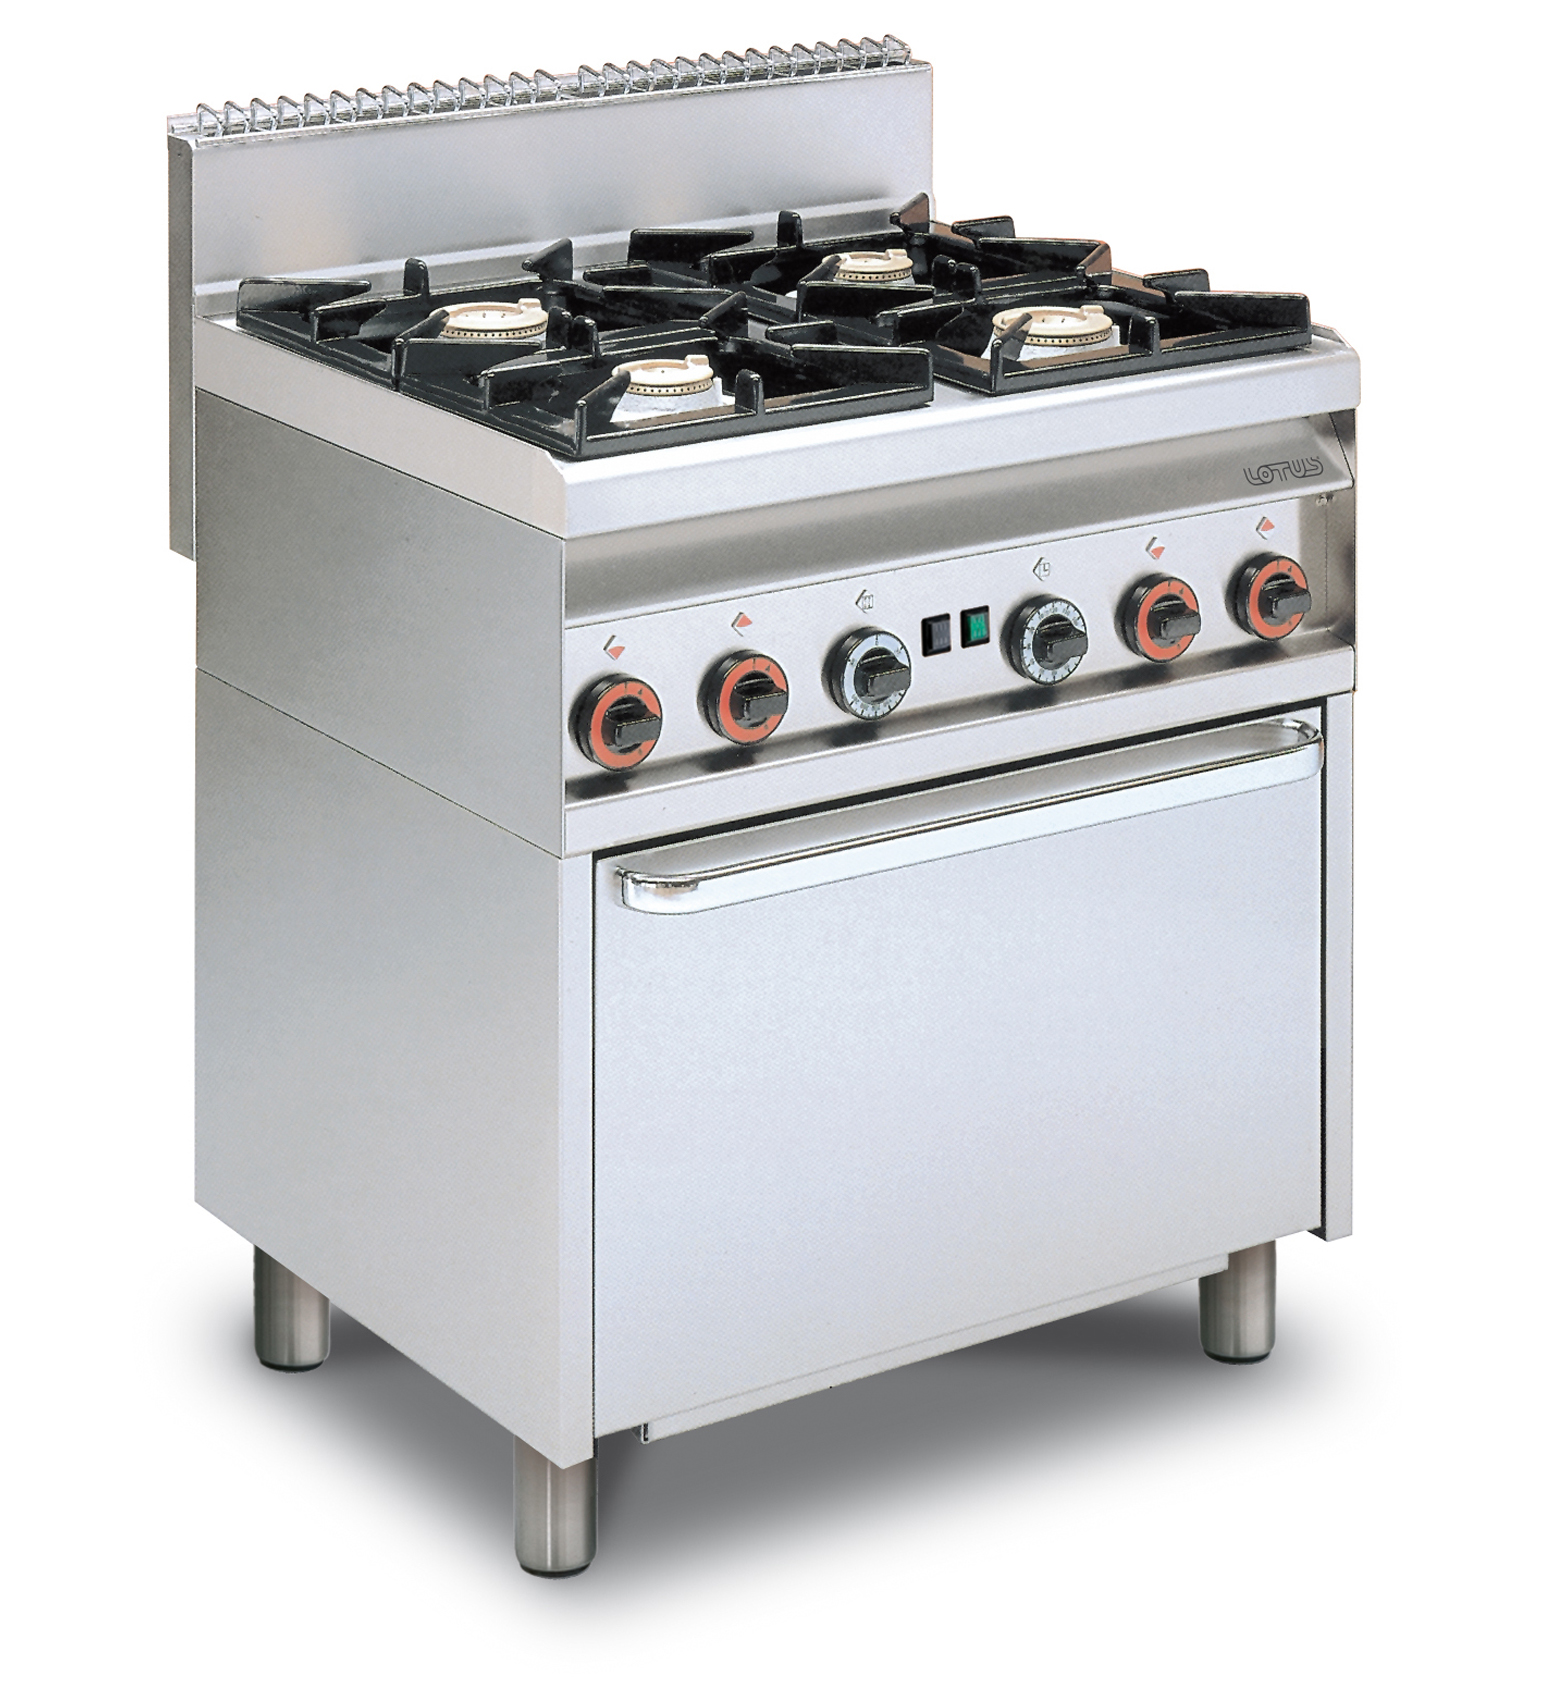 Cucine Industriali - Lotus SpA - ampia gamma di cucine industriali ...